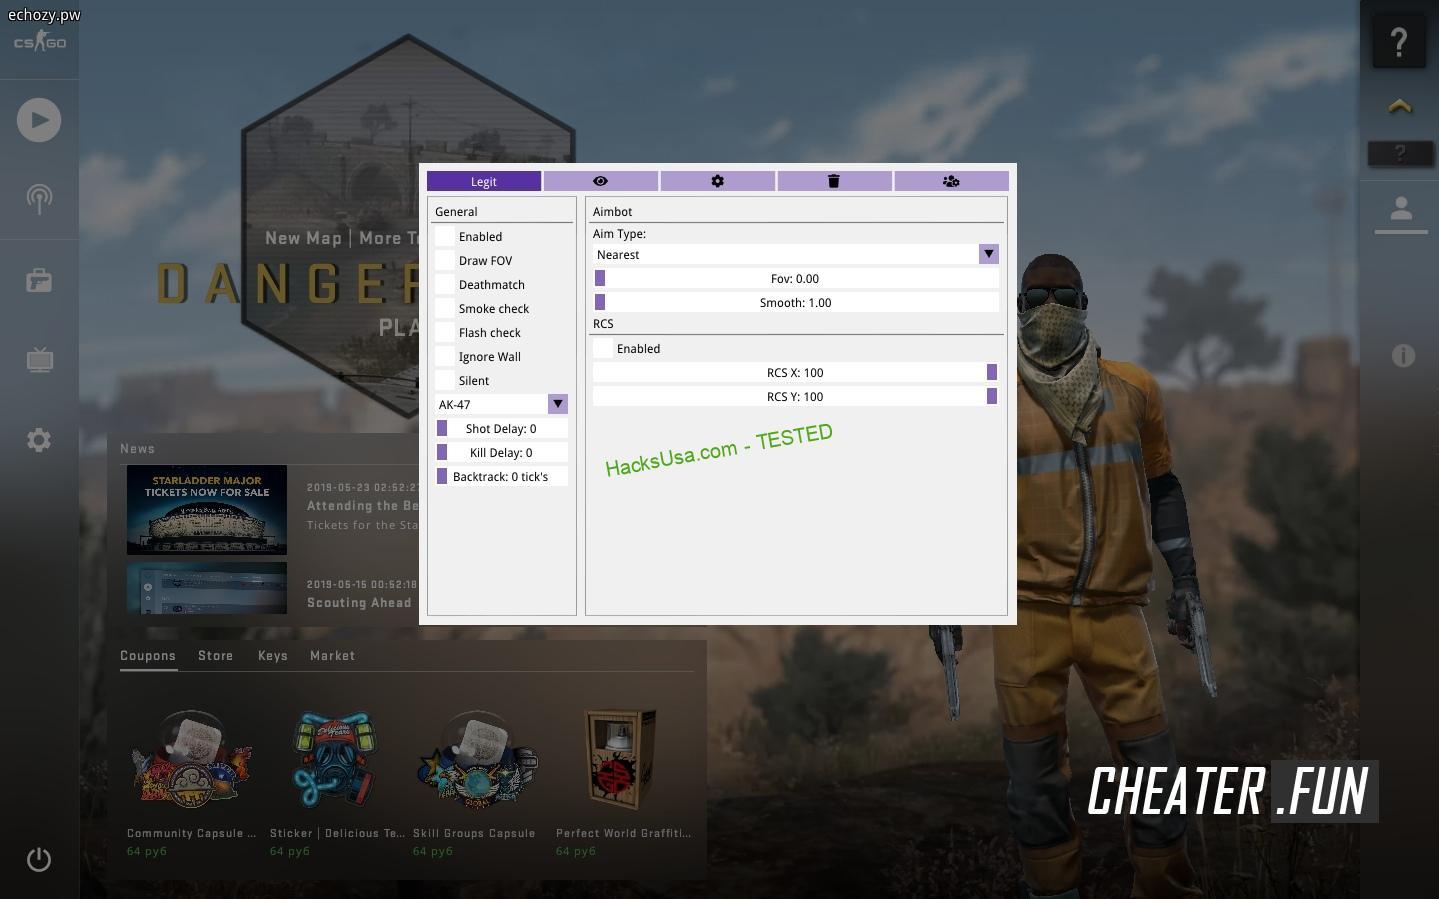 Counter-Strike: GO Echozy.pw (ex Xyron) free legit cheat